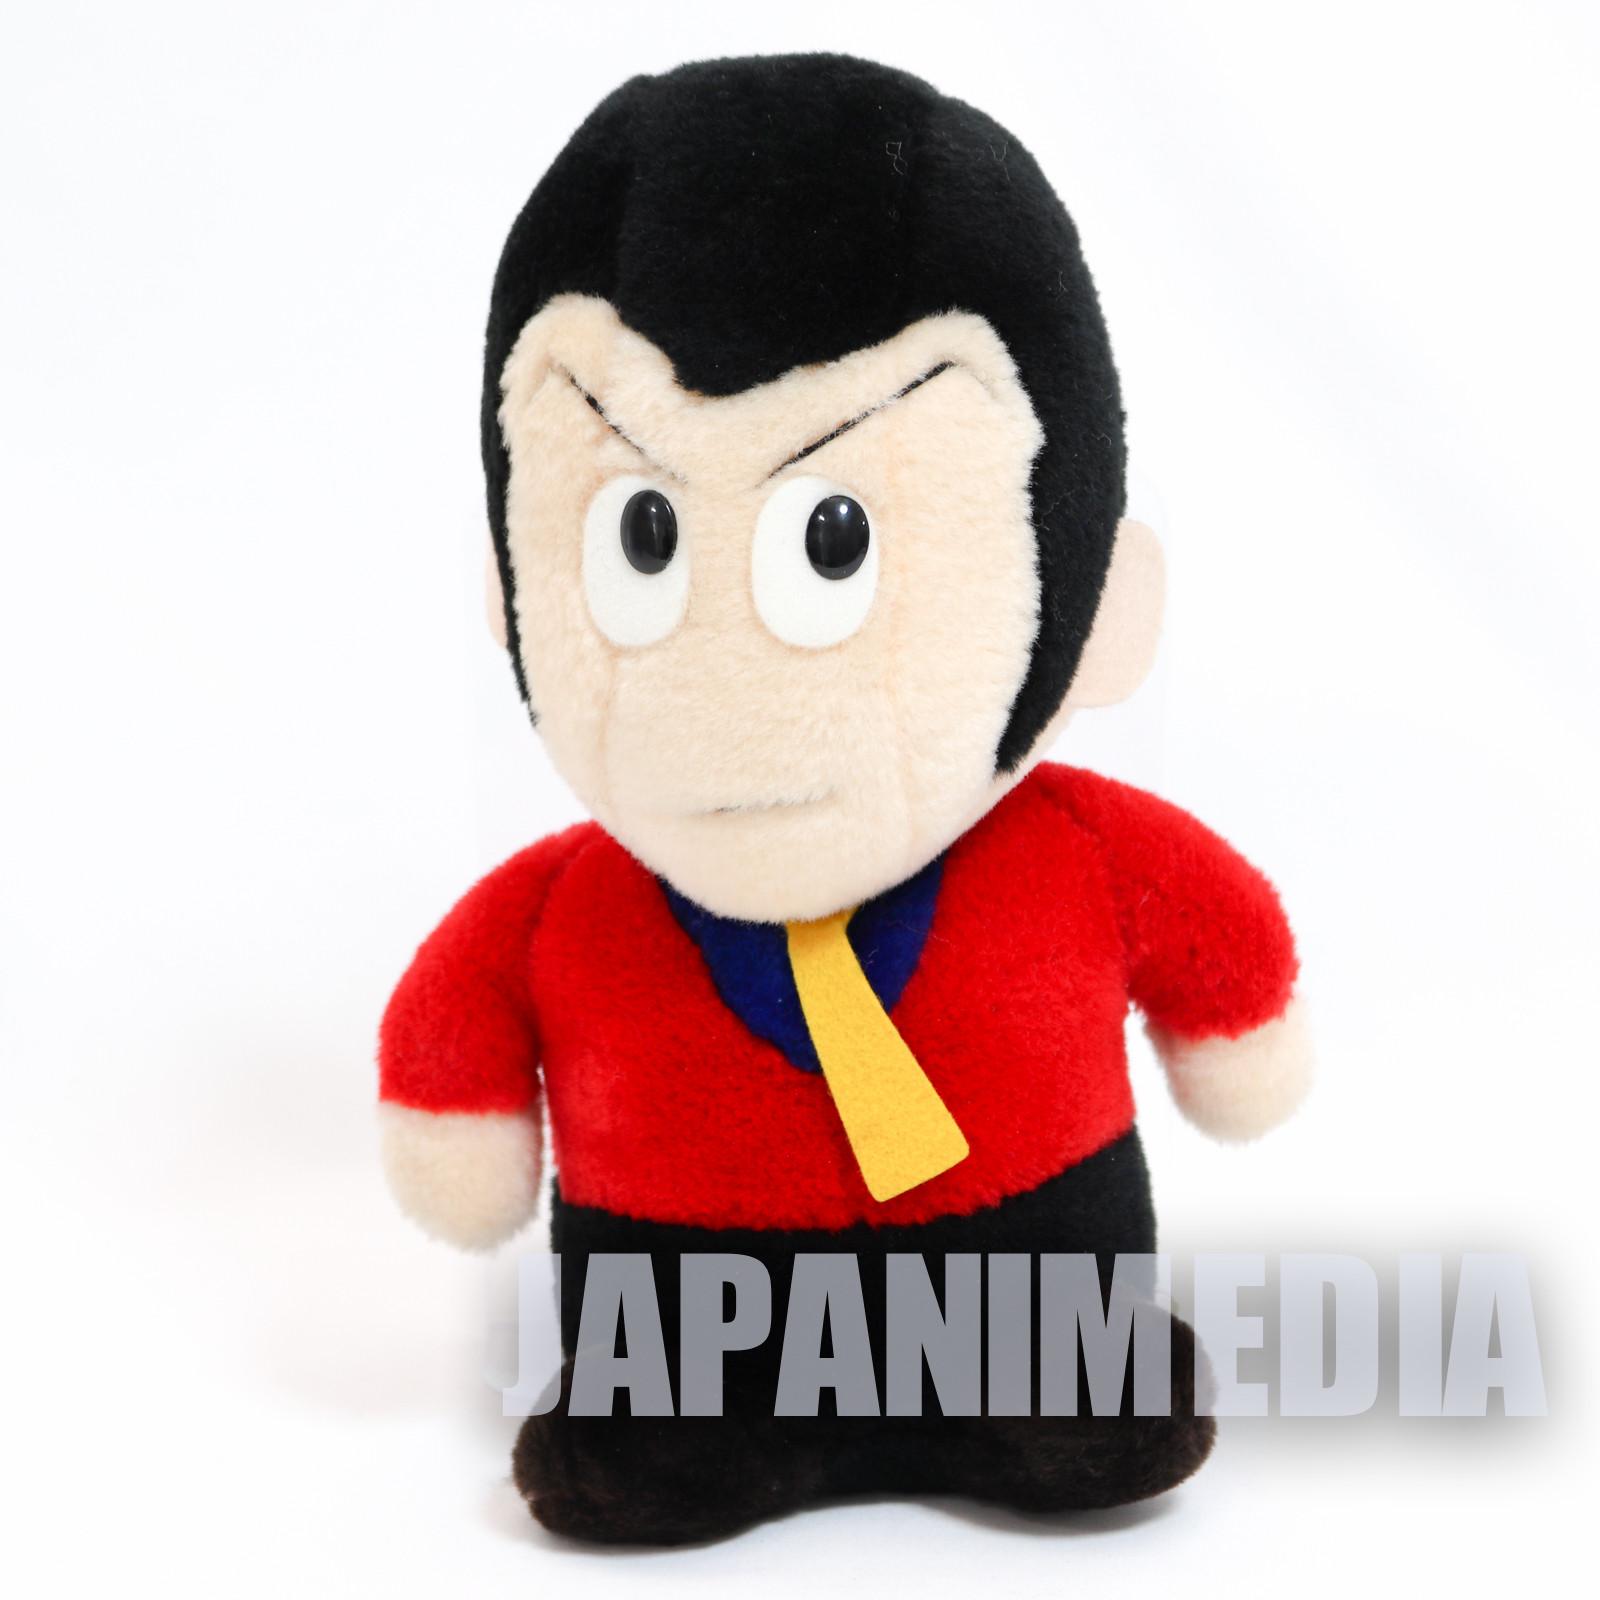 "Retro RARE! Lupin the 3rd Third LUPIN Plush Doll 9"" JAPAN ANIME MANGA"